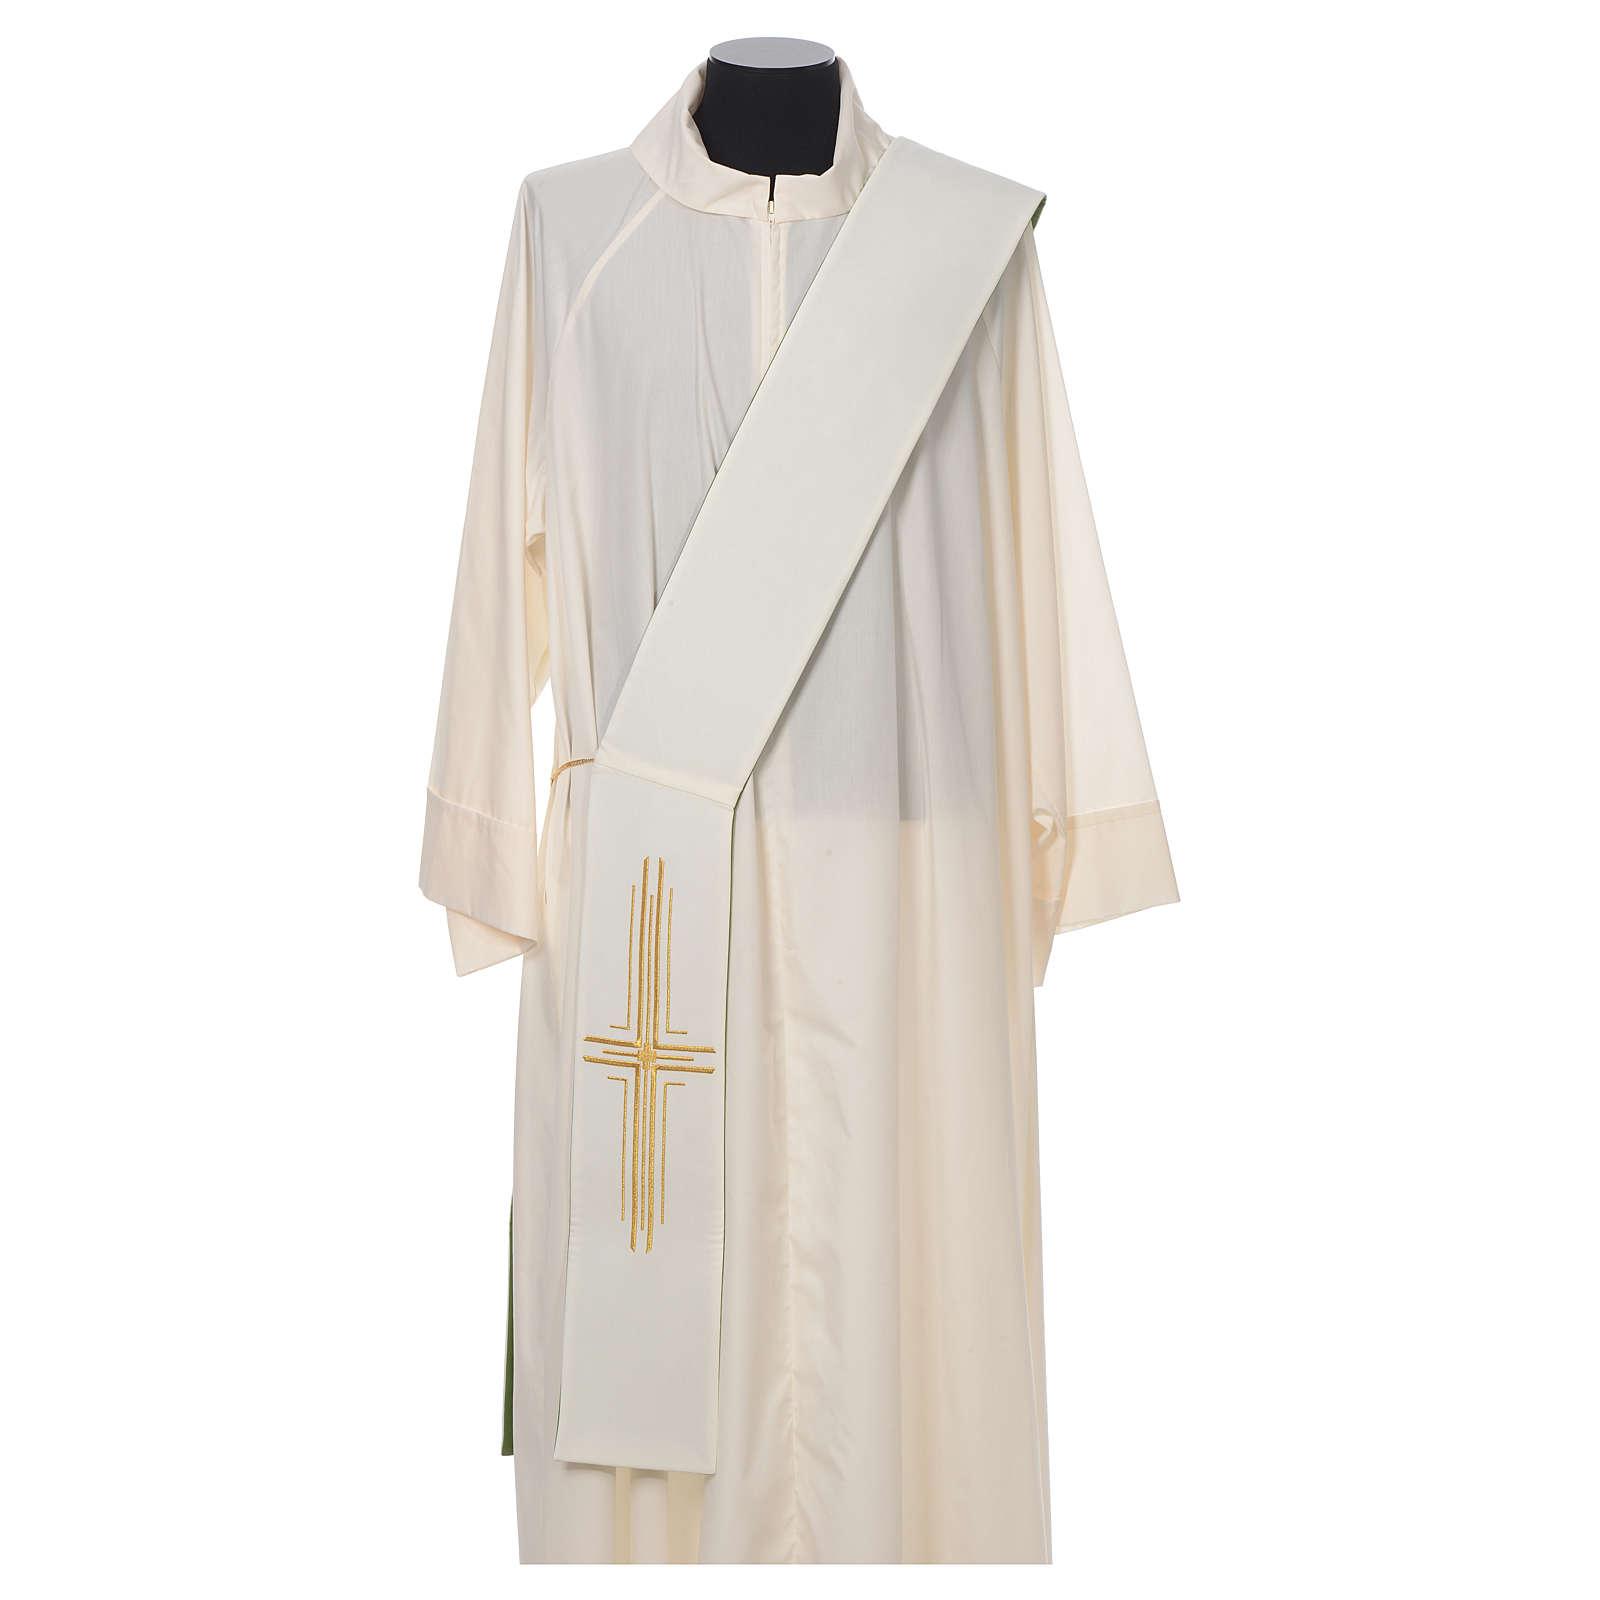 Estola diaconal poliéster cruz blanco verde reversible 4